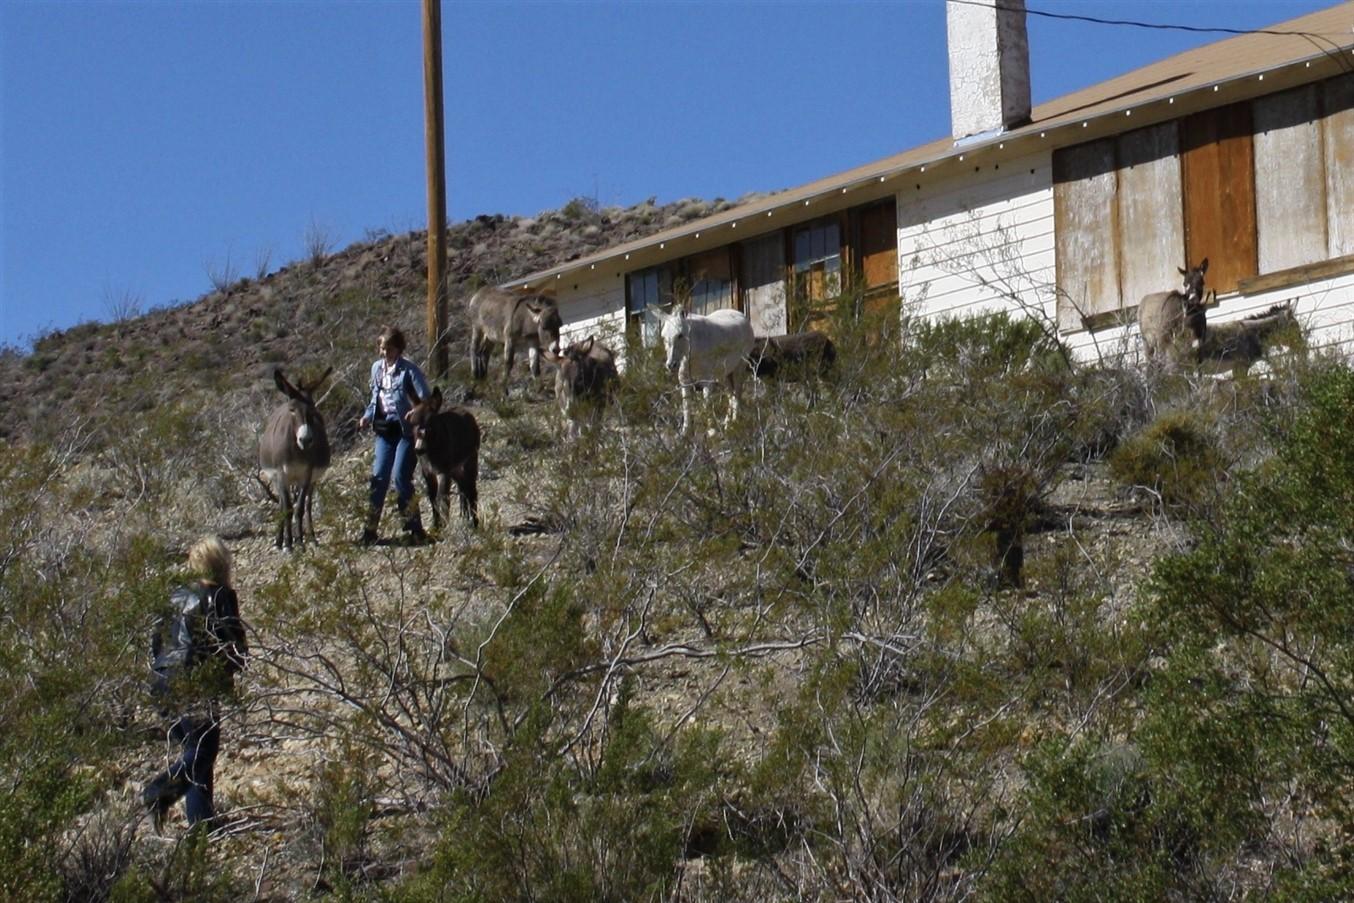 2012 03 14 Route 66 Road Trip 98 Oatman Highway Arizona.jpg